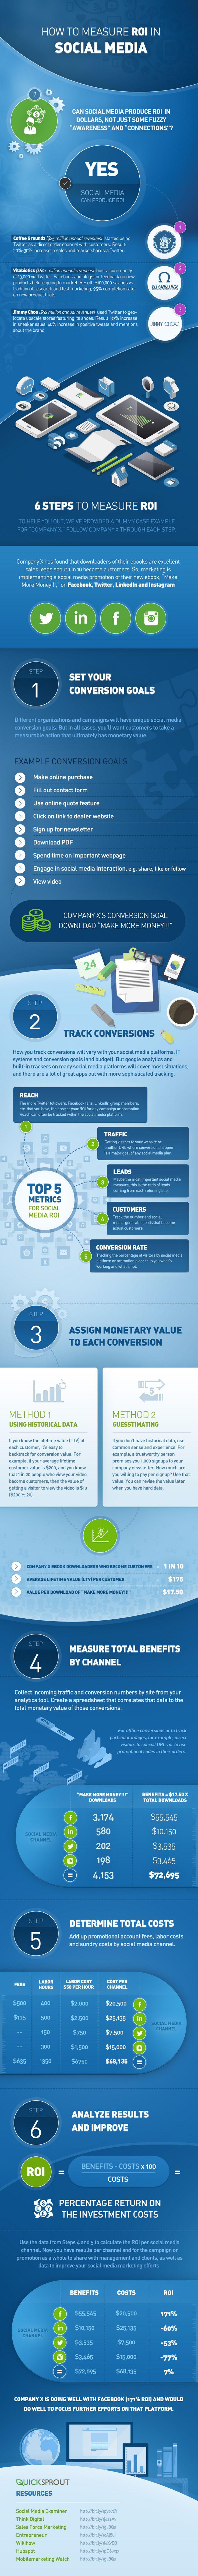 6 Steps to Measuring Social Media ROI. #socialmedia #ROI